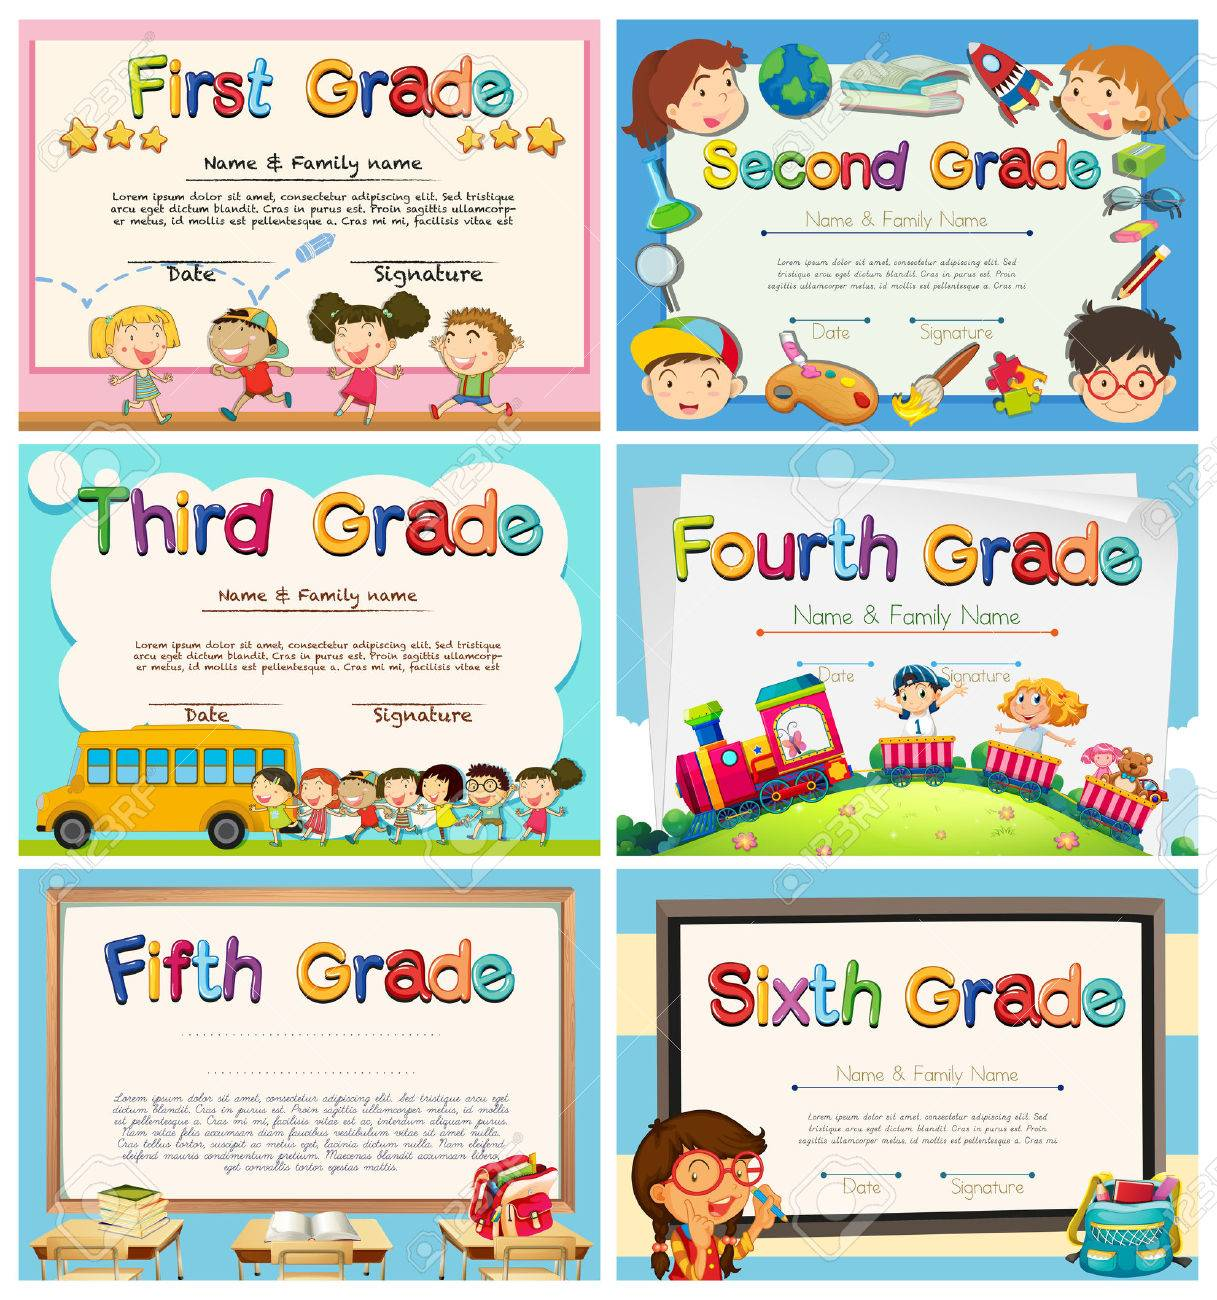 Certificates For Children In Primary School Illustration Royalty